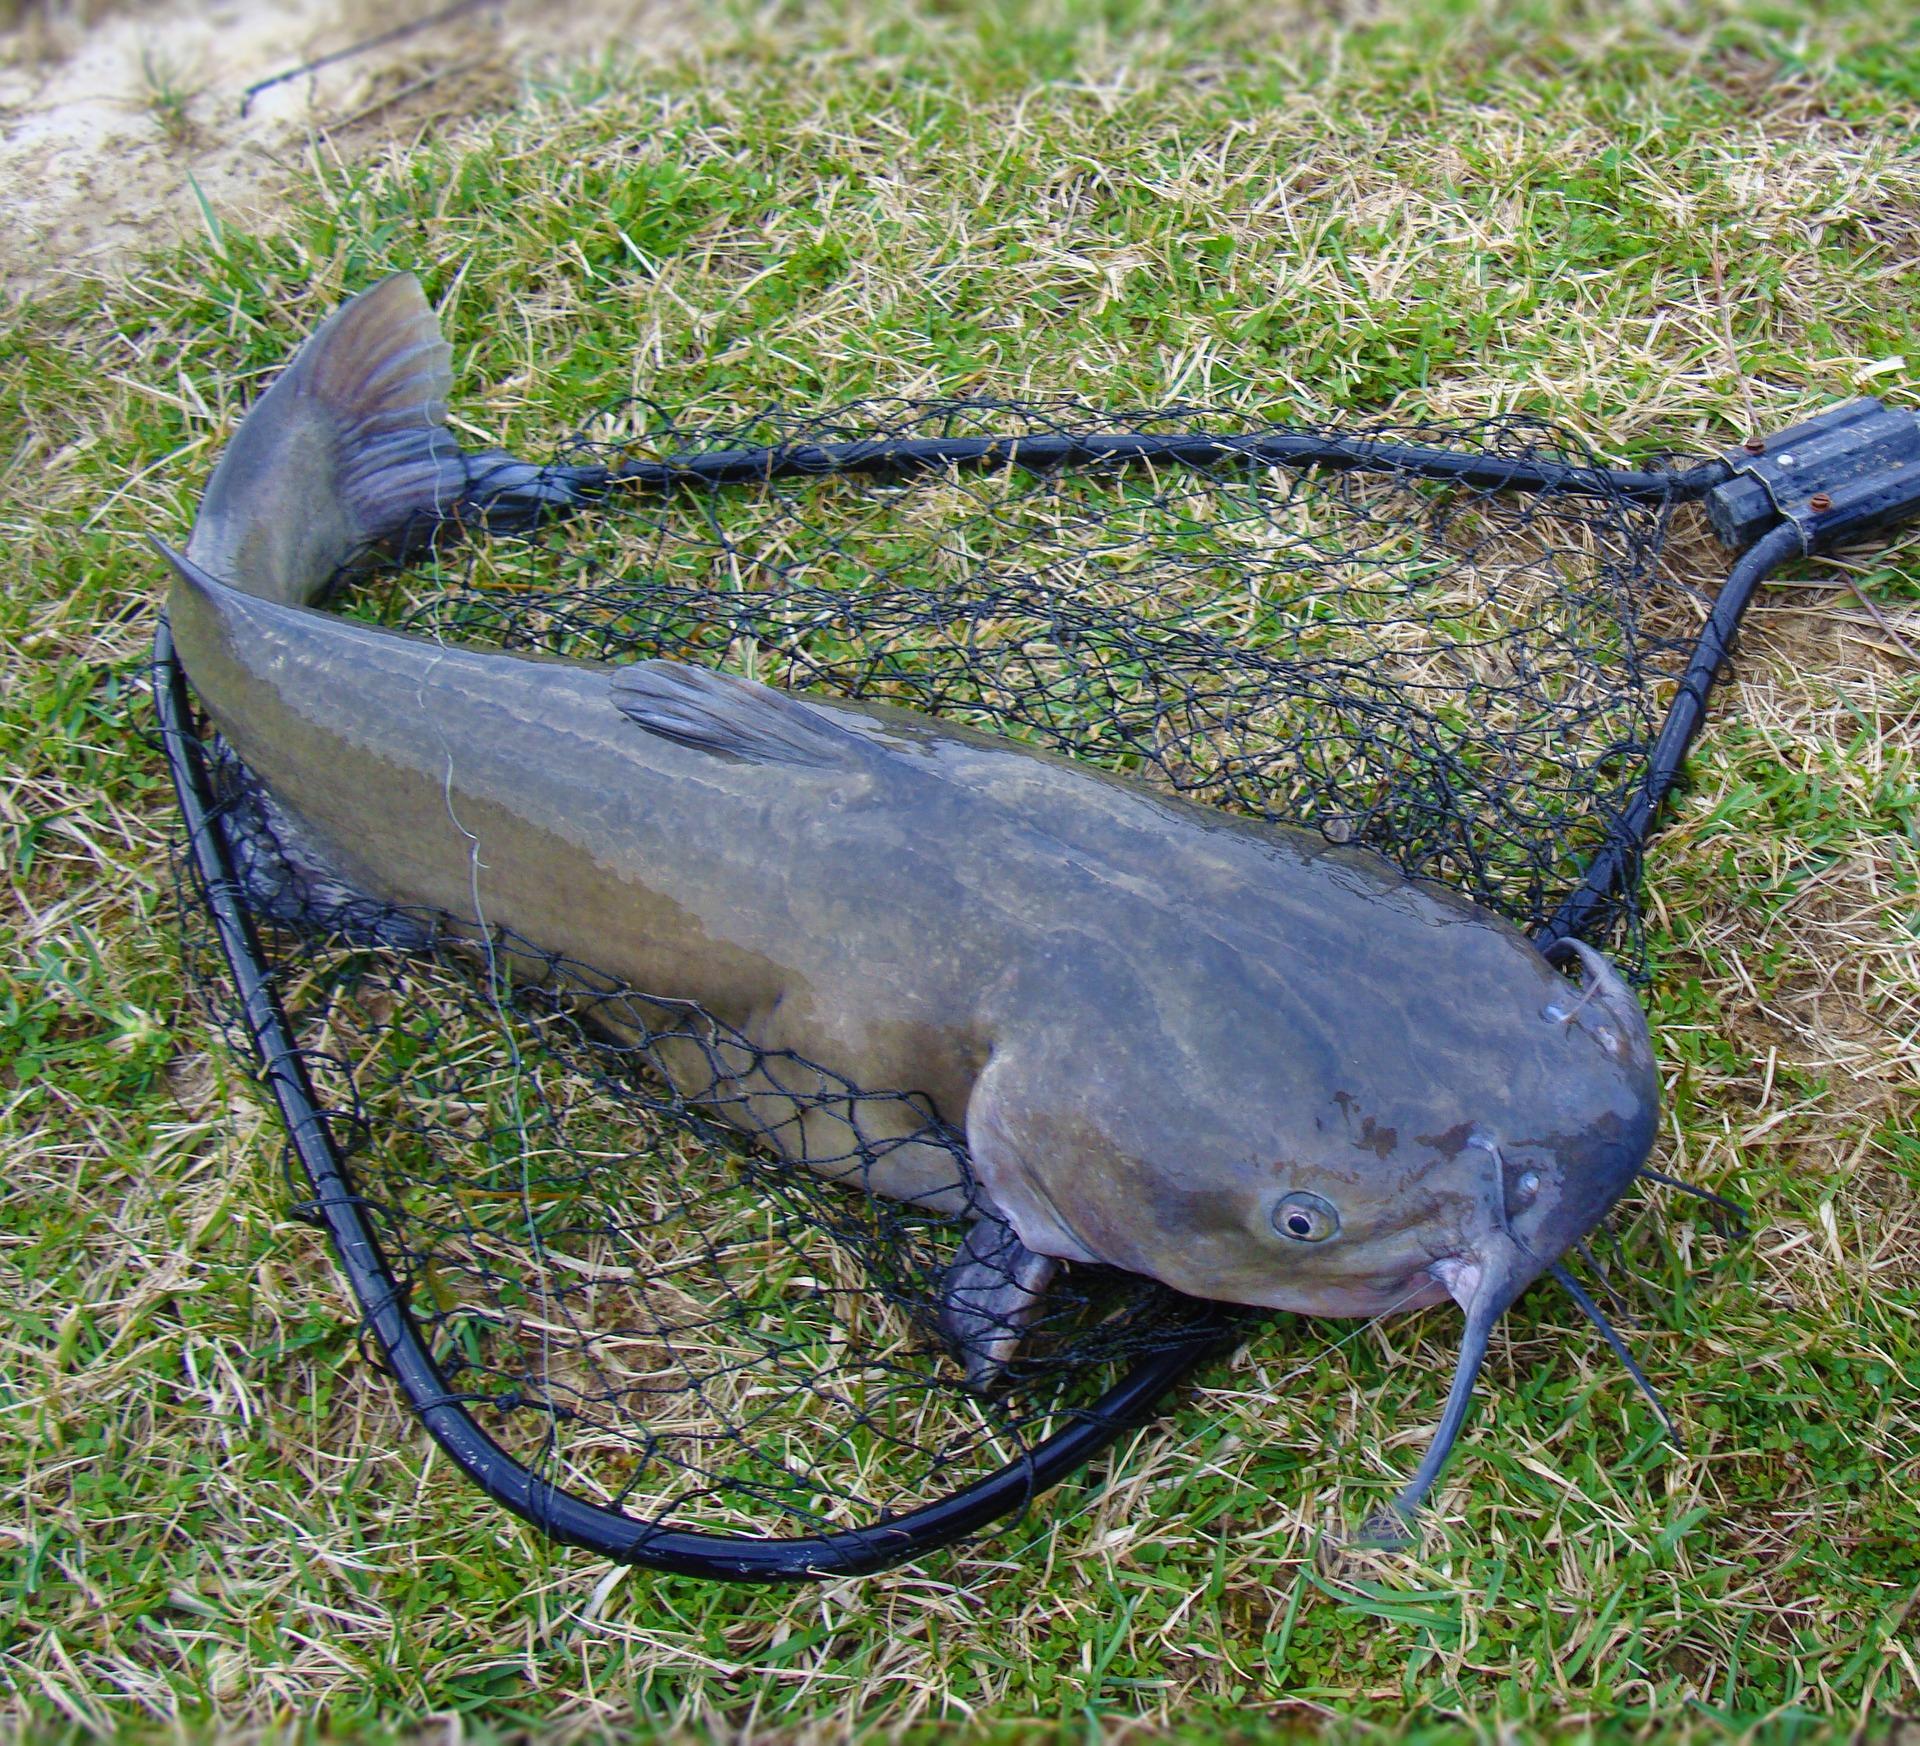 Channel catfish, everglades fishing, everglades wildlife, gladesmen culture